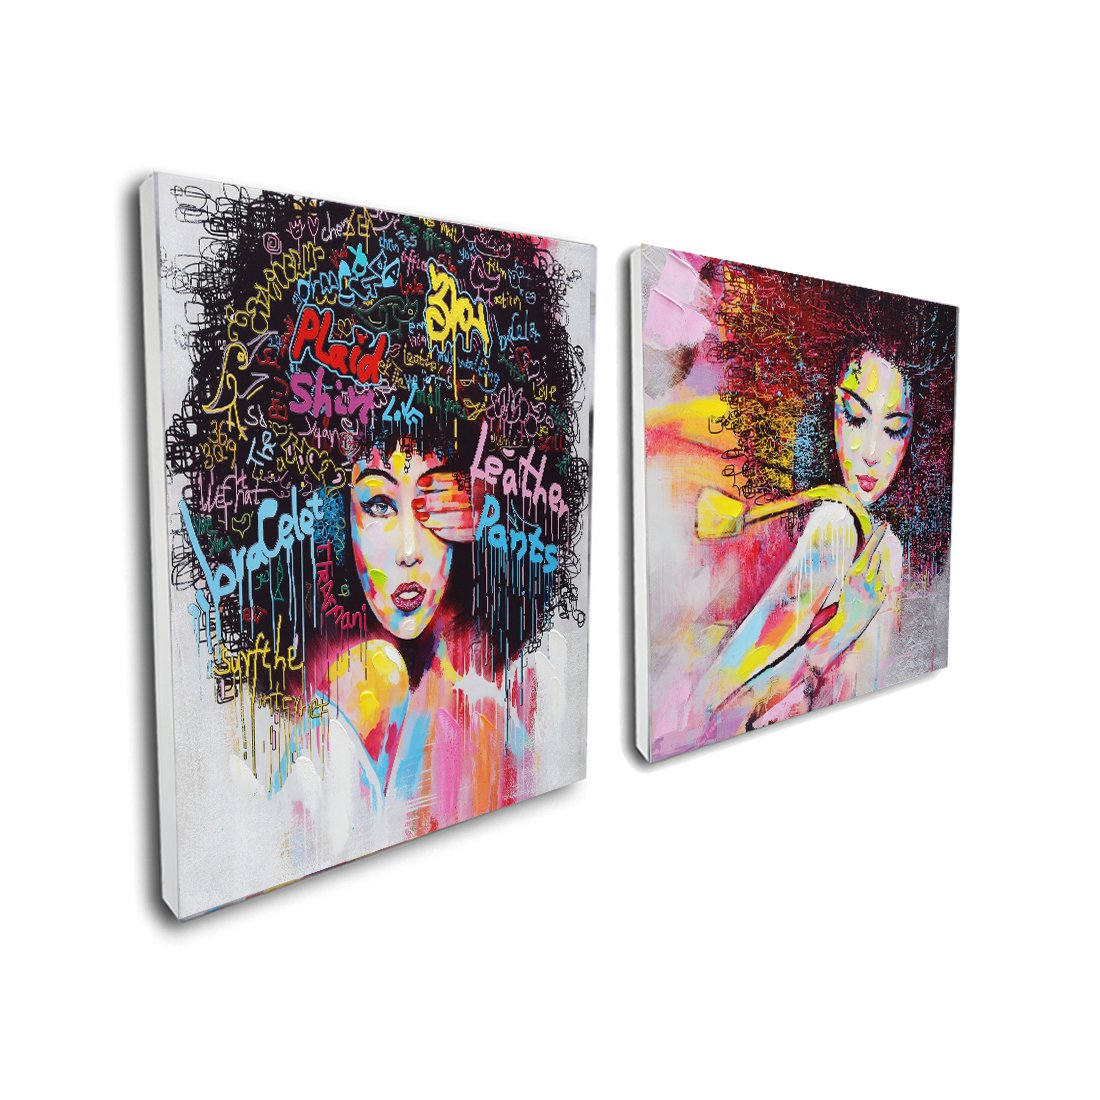 Pinetree Art African American Black Art Canvas Wall Art, Original Designed Pop Graffiti Style Canvas Painting on Print (40 x 40 inch, C Framed & D Framed)